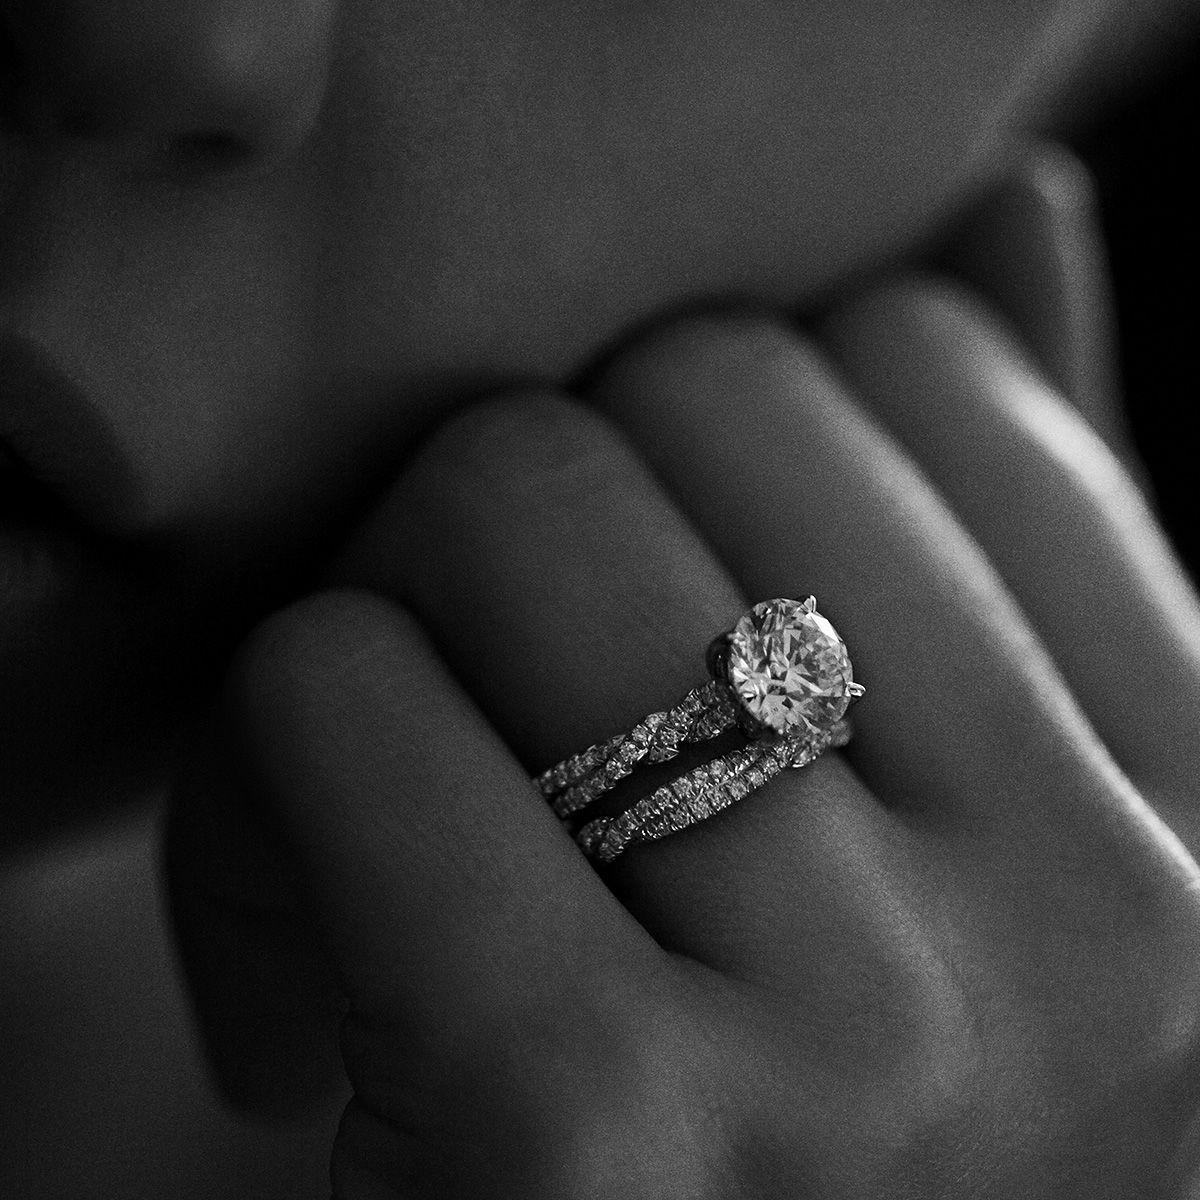 Unique Details Distinguish A David Yurman Engagement Ring From The Rest